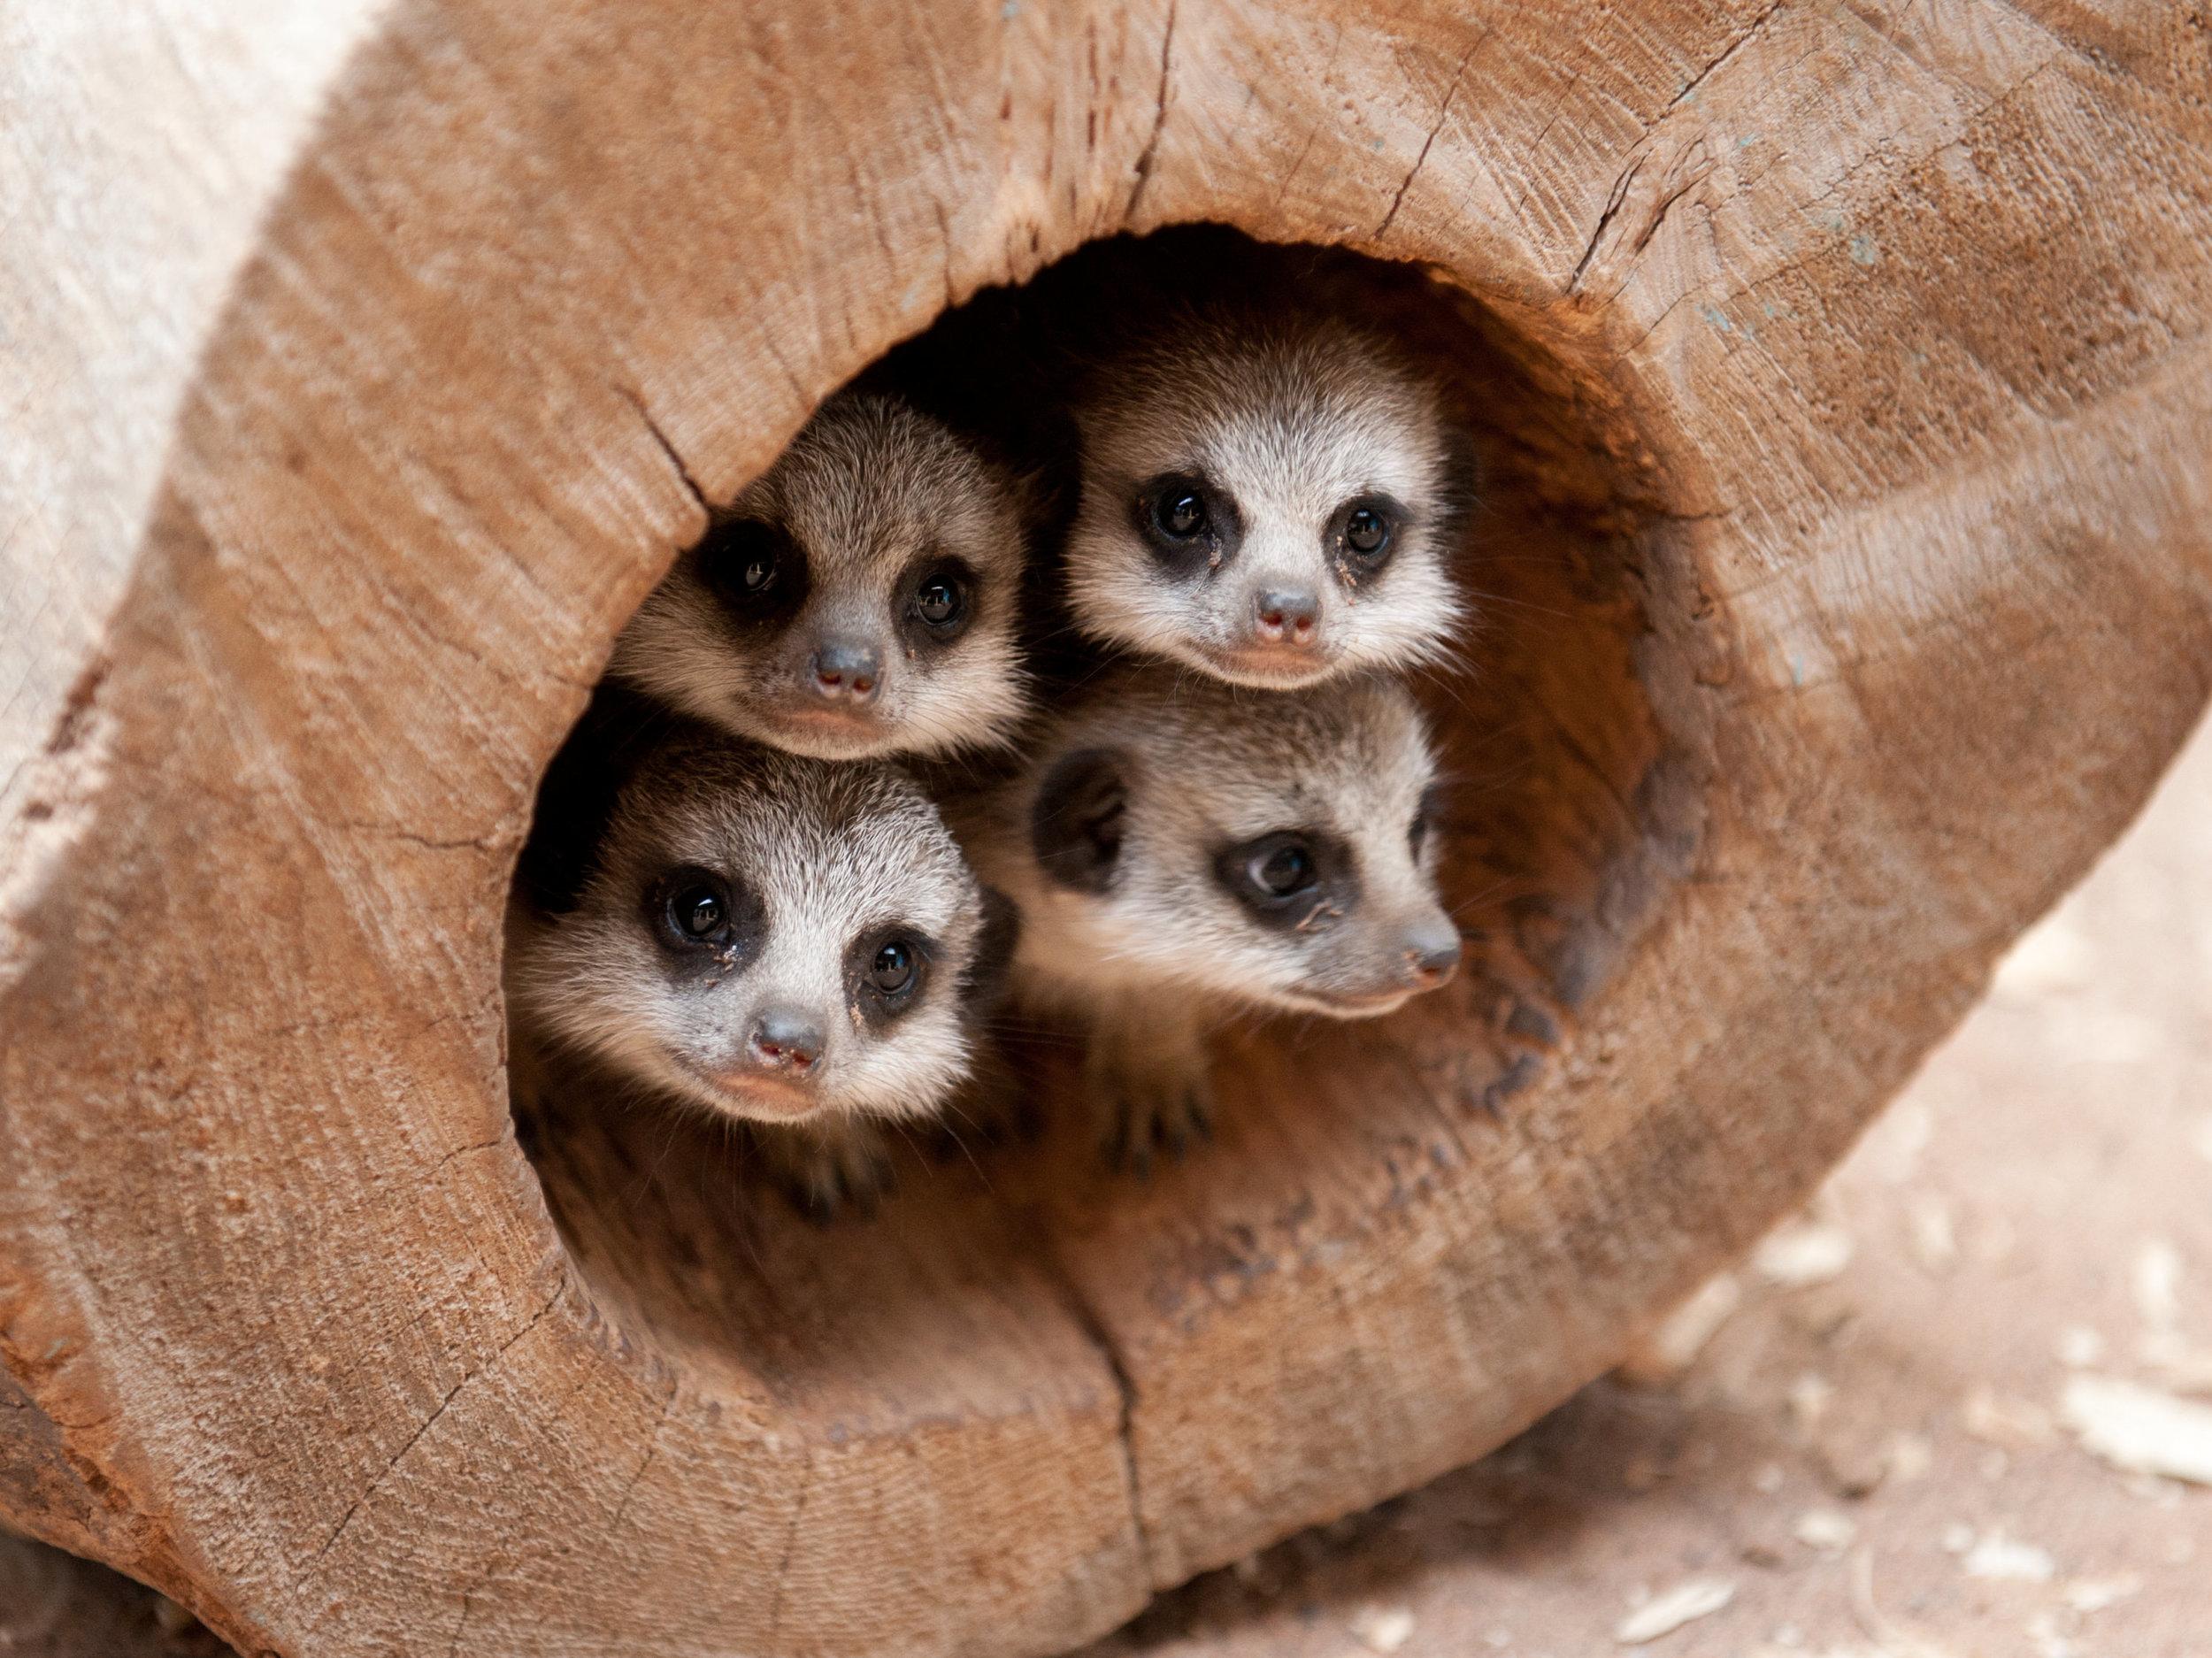 New baby meerkats at St Andrews Aquarium, Scotland.